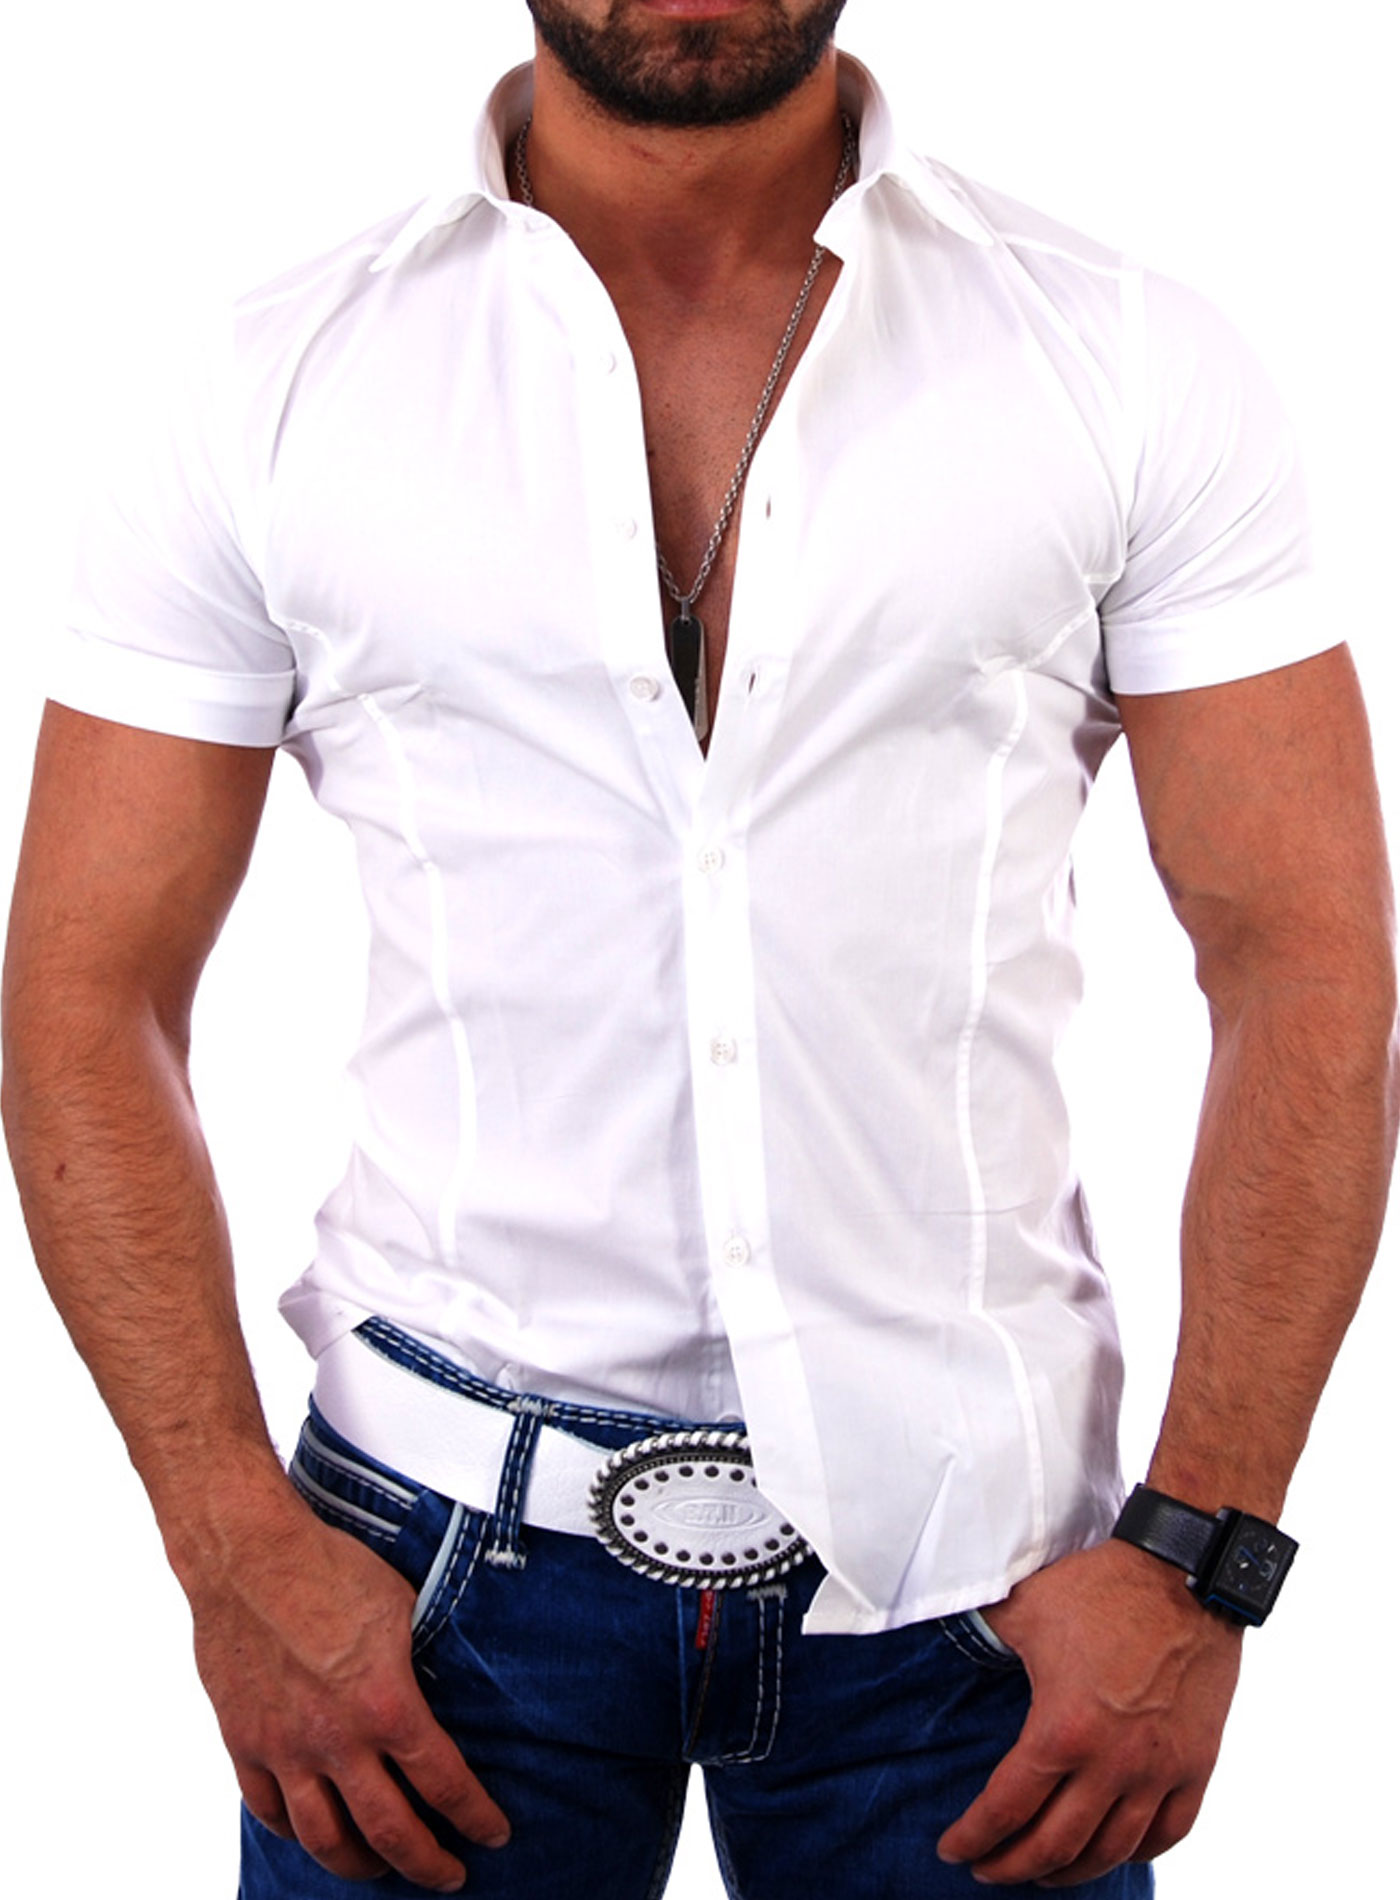 redbridge rb 2156 herren kurzarm hemd polo t shirt freizeithemd slim fit ebay. Black Bedroom Furniture Sets. Home Design Ideas